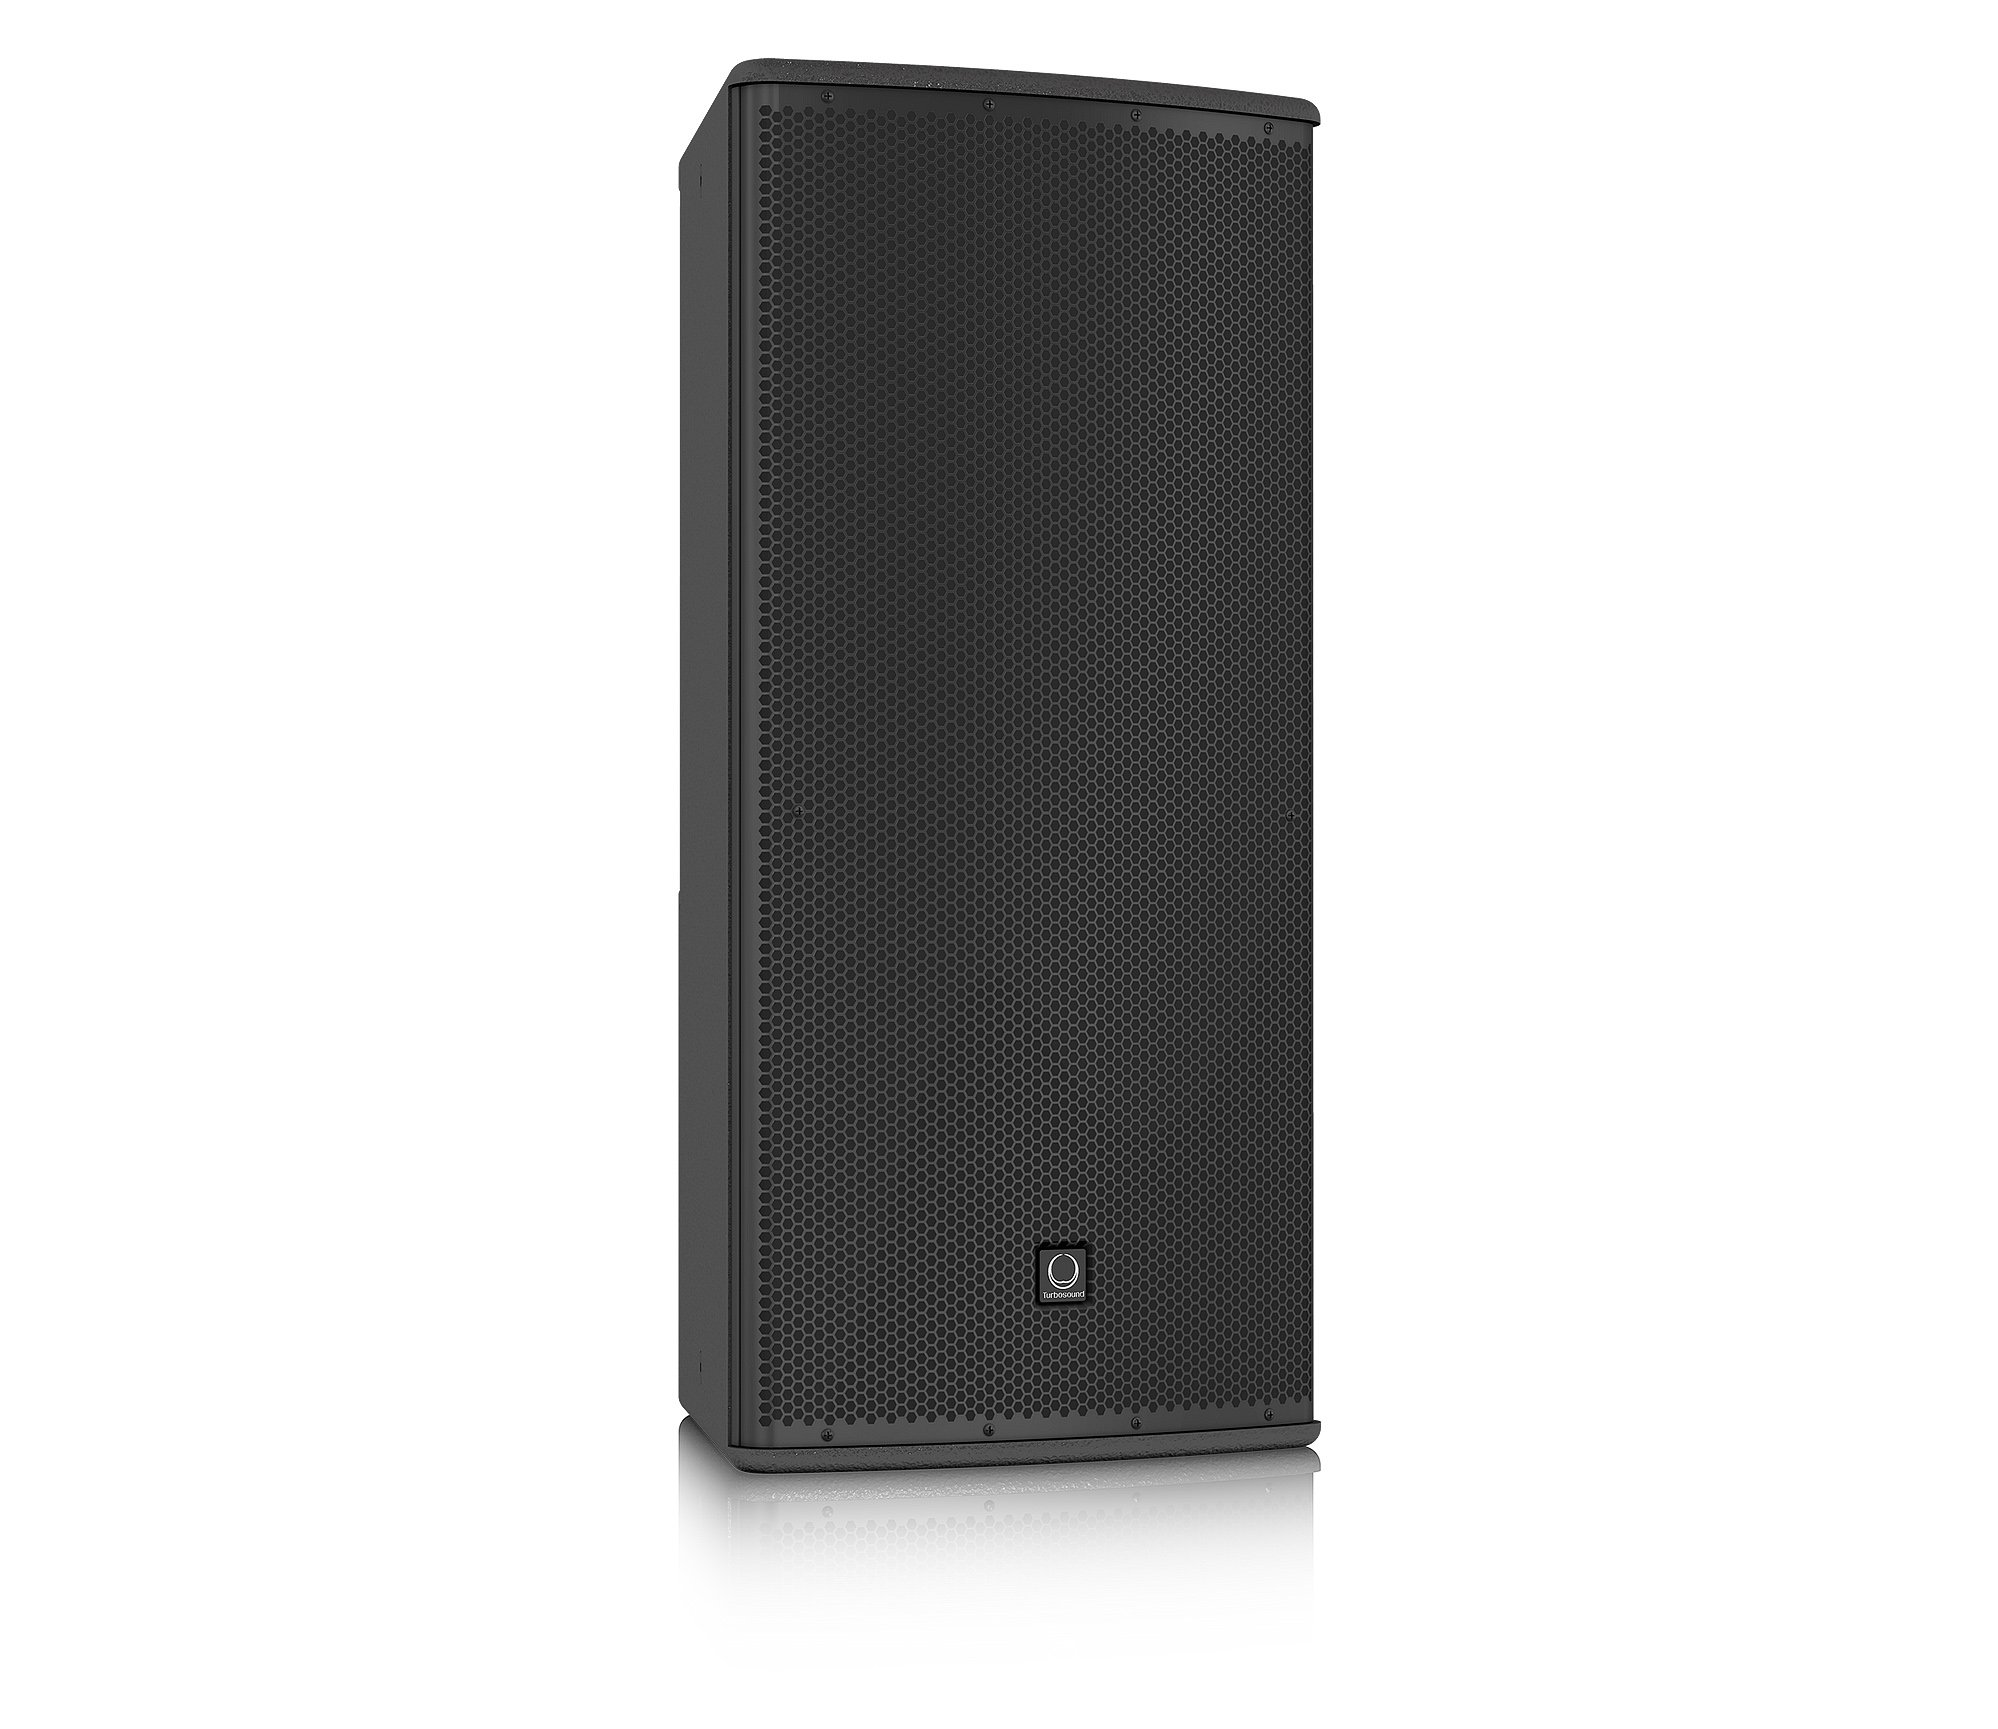 "15"" 500W (8 Ohms) Weather Resistant 2-Way Full-Range Passive/Bi-Amp Loudspeaker with 60°x40° Dispersion in Black"